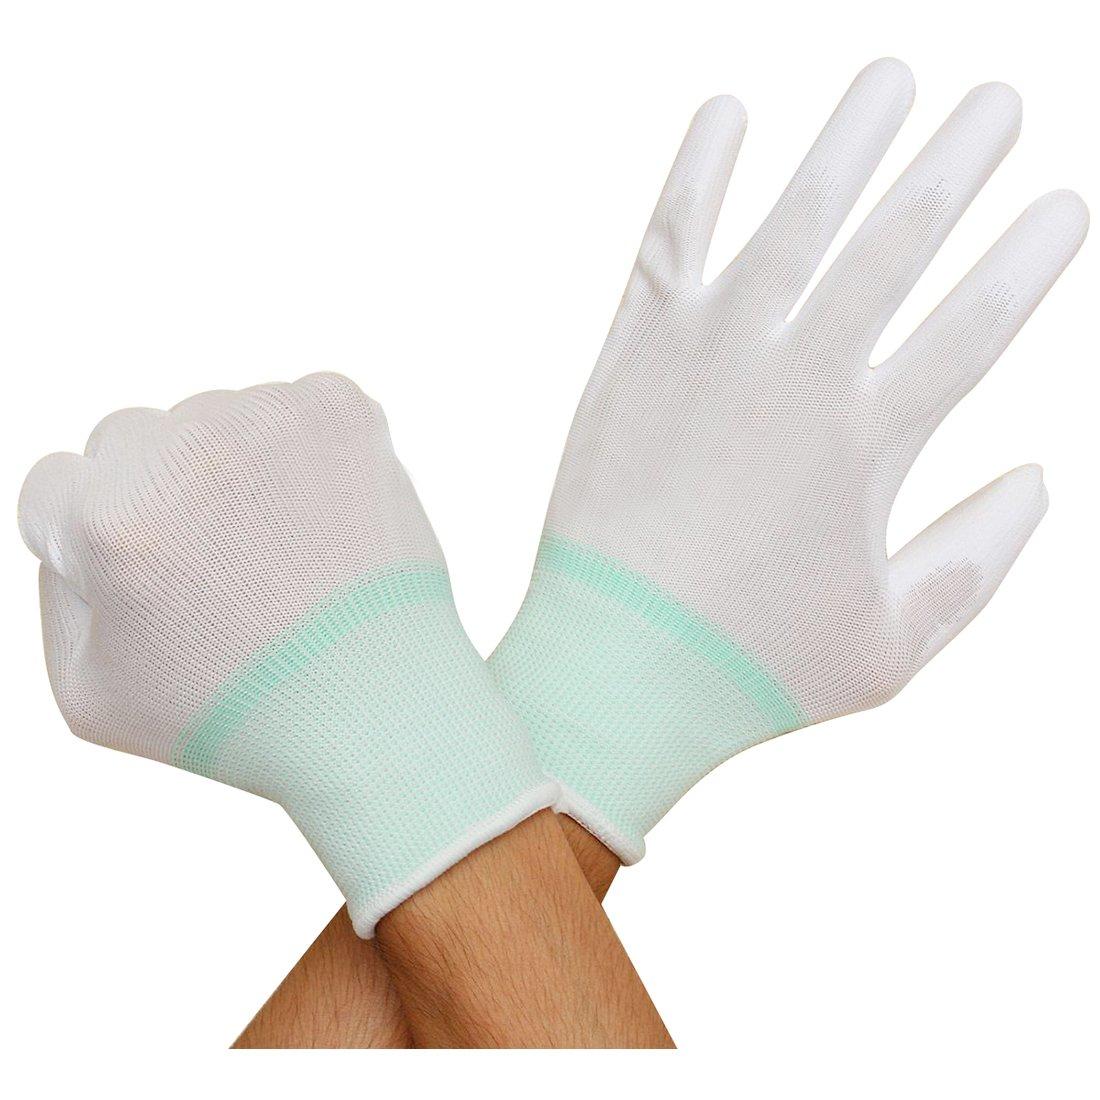 SODIAL(R) 1 Pair ESD PC Computer Working Anti-skid Anti Skid Anti-static White Gloves New